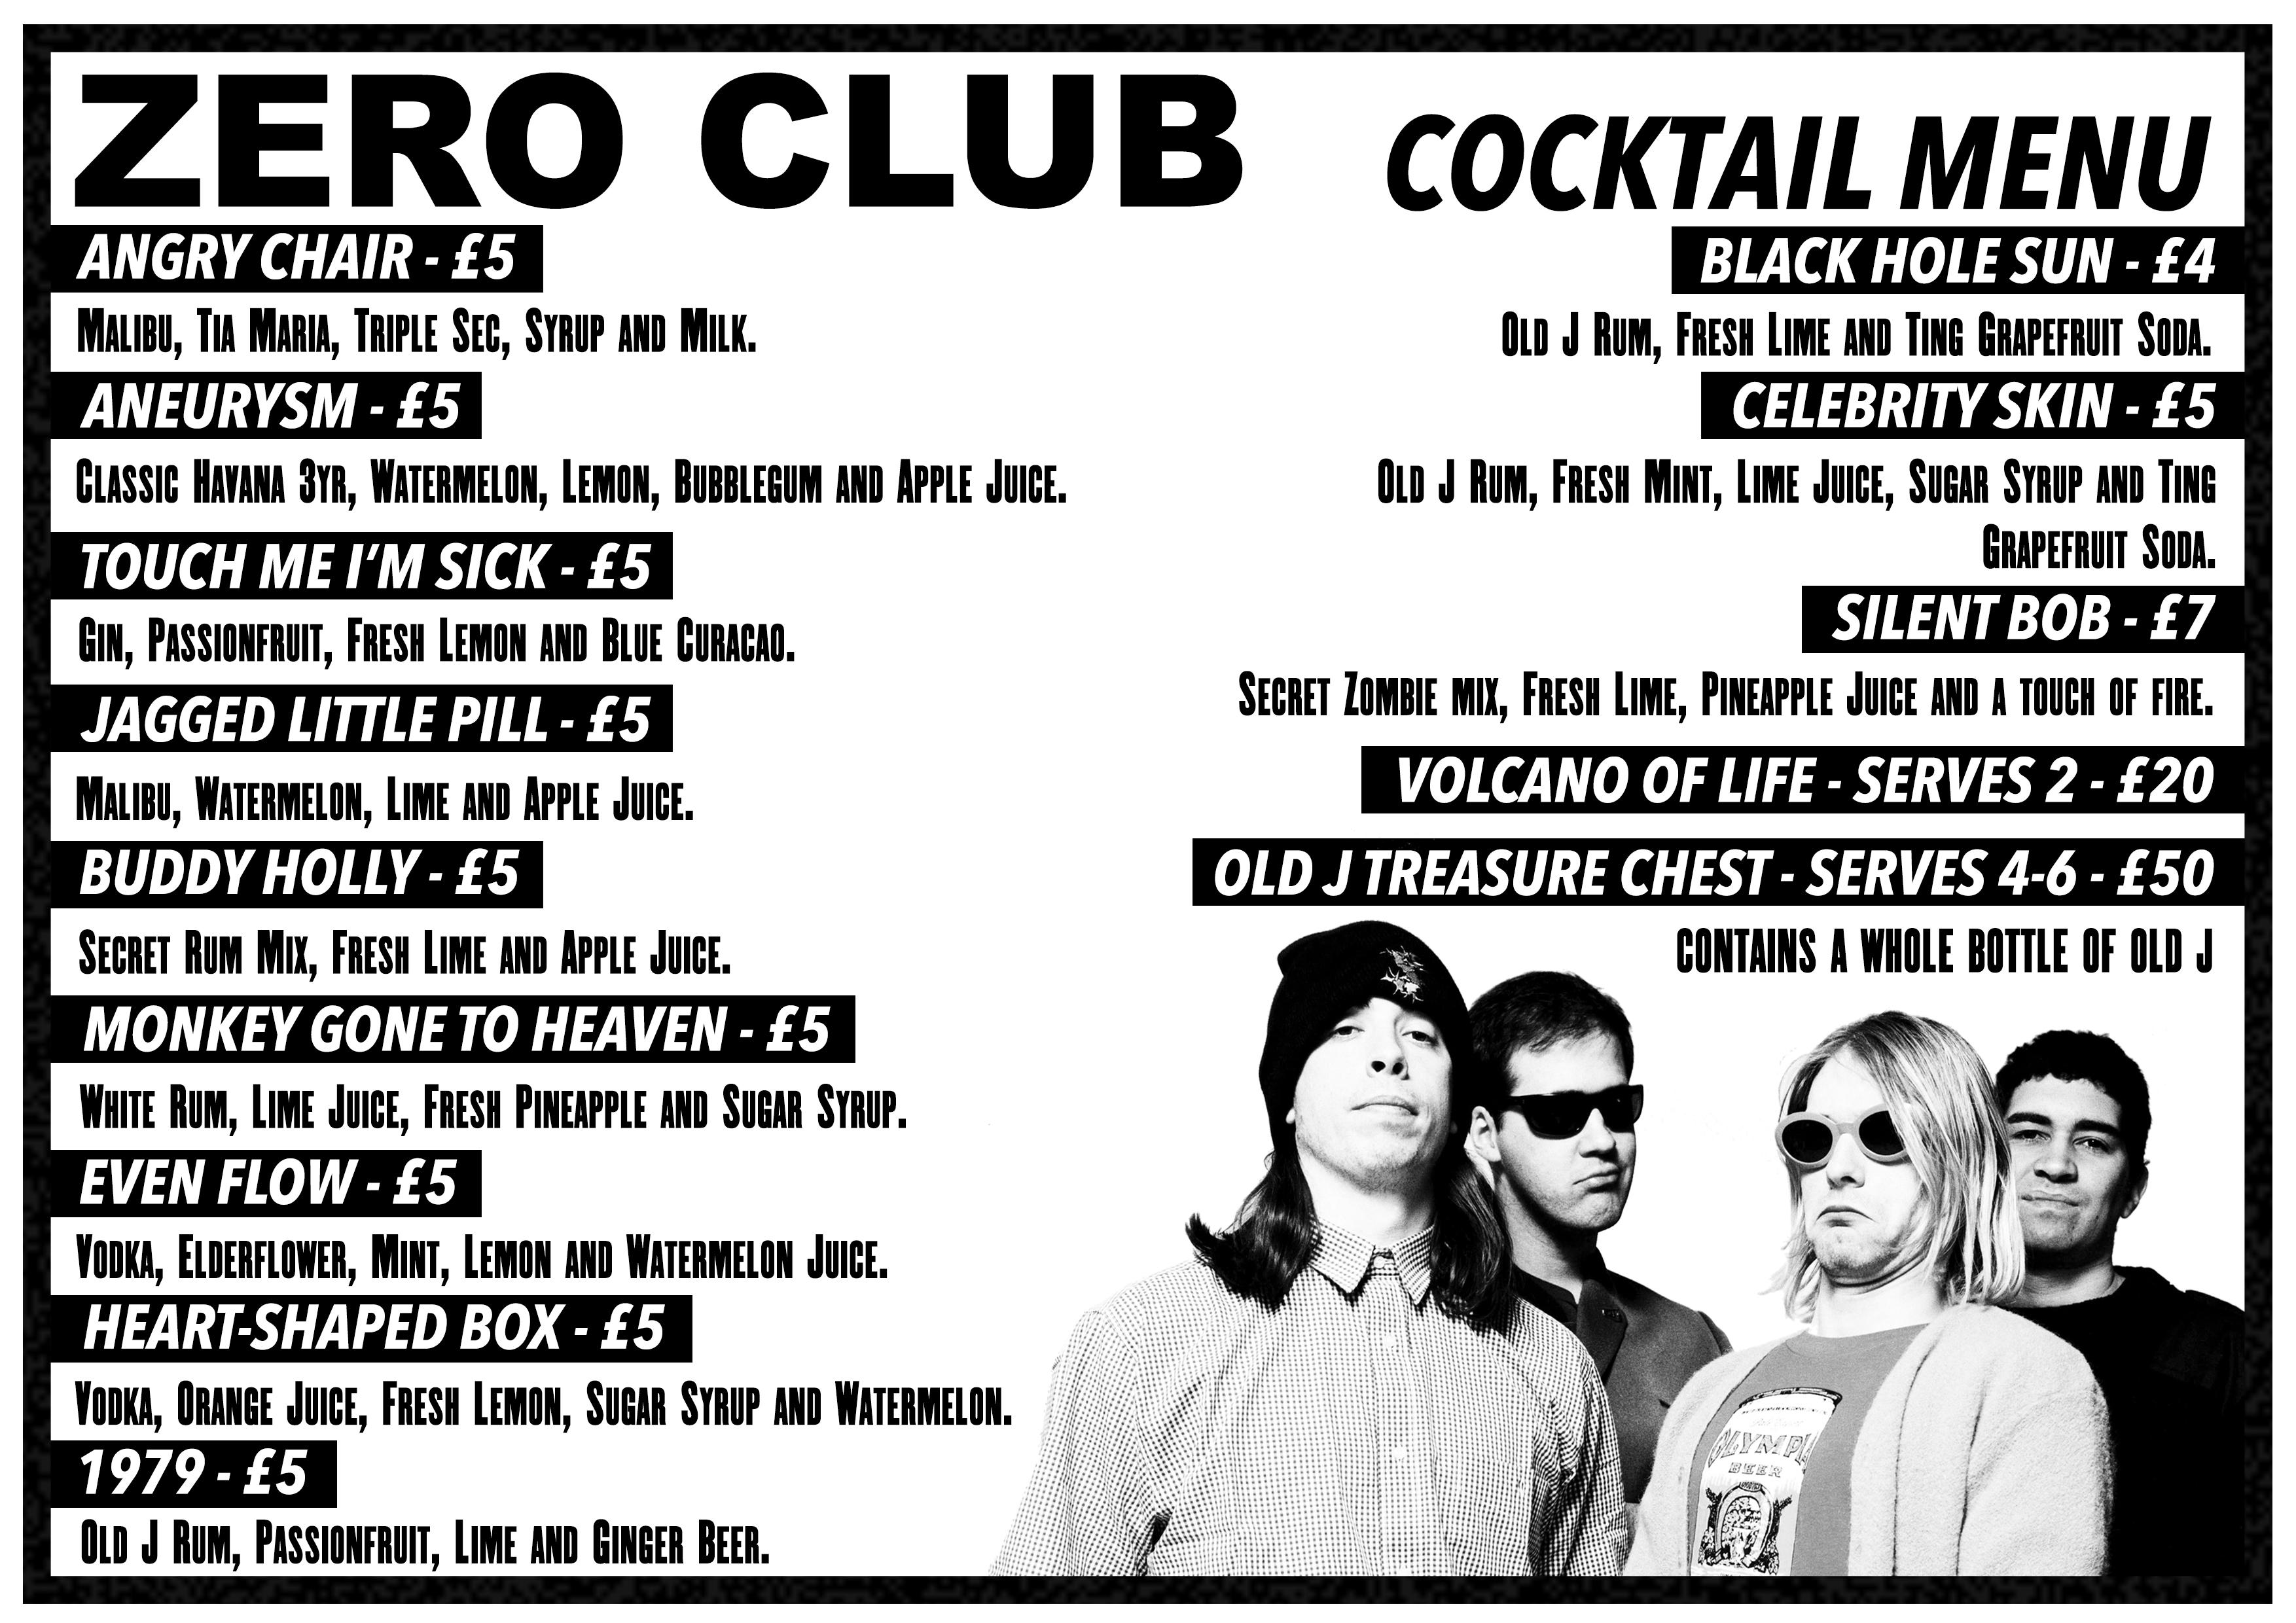 Zero Club Cocktail Menu at Zombie Shack - Red Cardinal Music